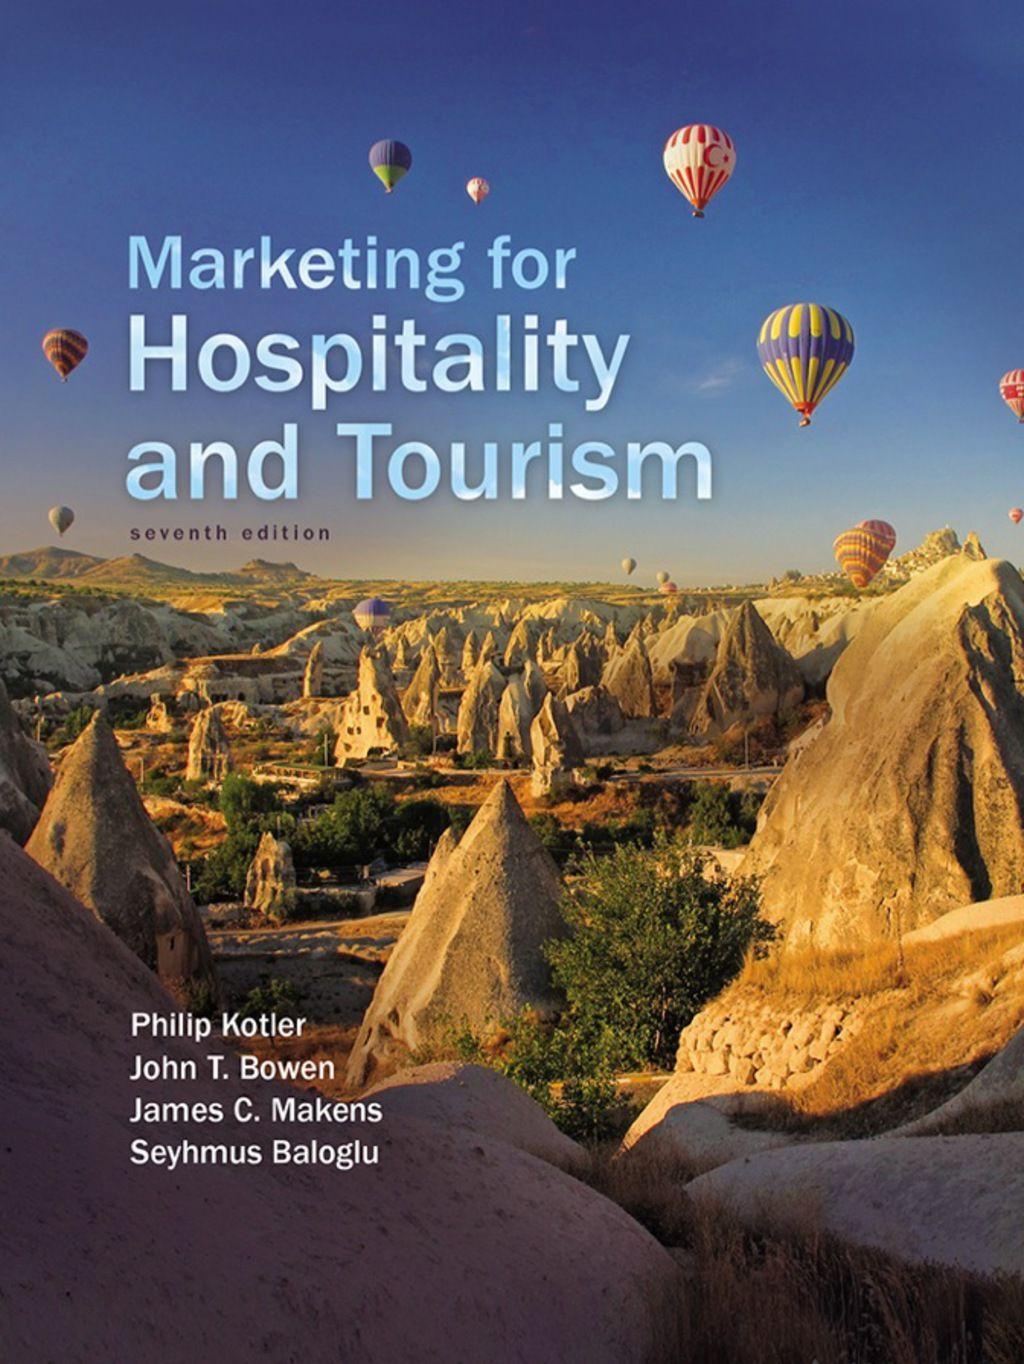 Marketing for Hospitality and Tourism (eBook Rental